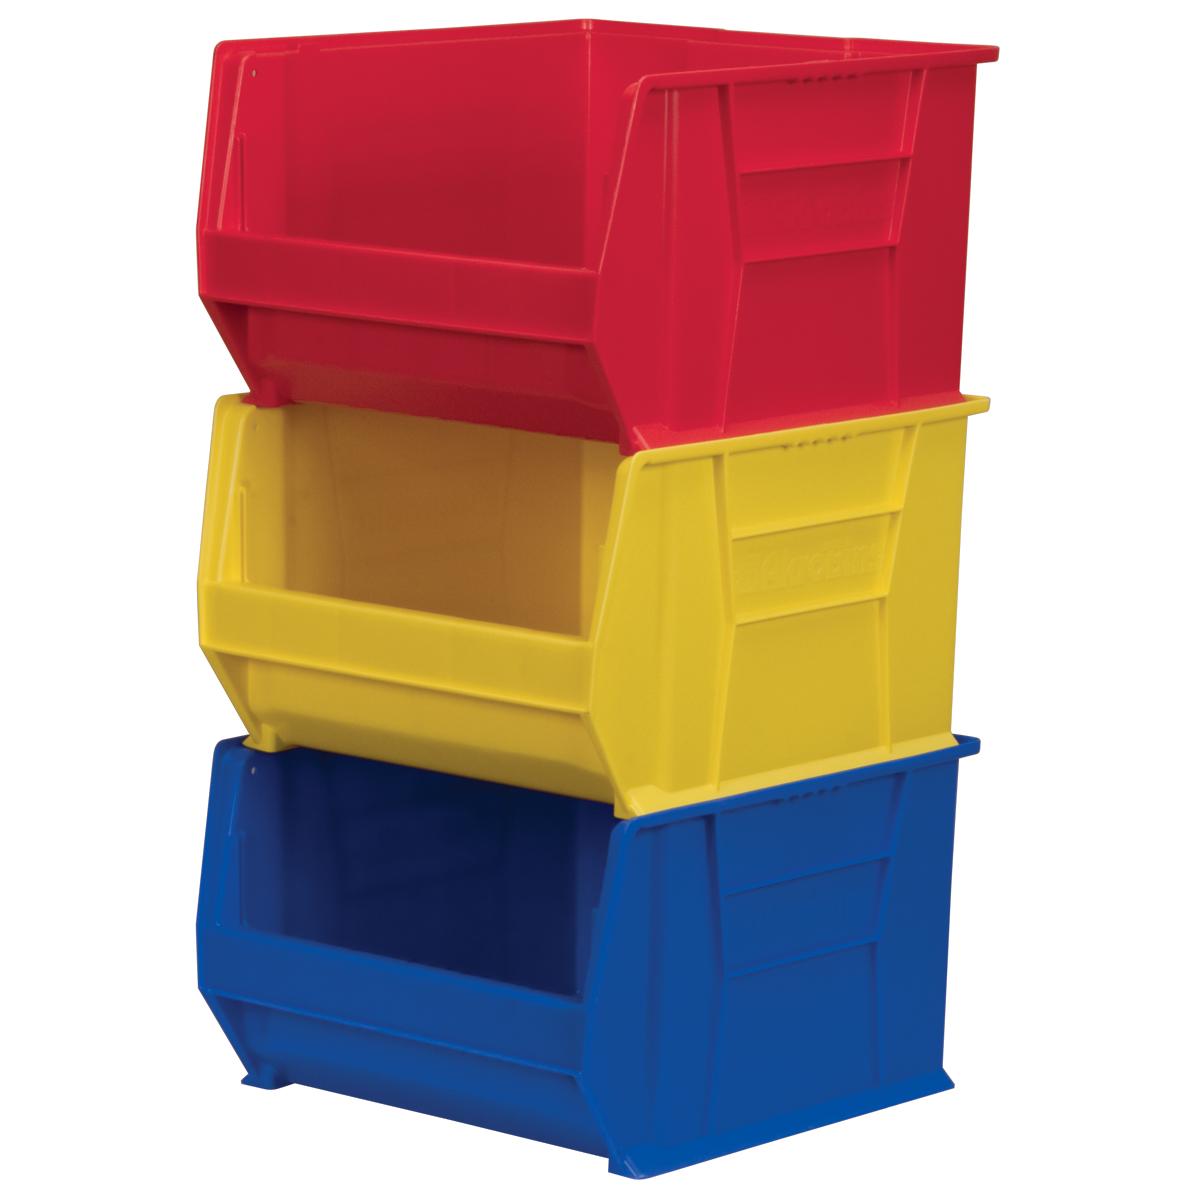 Plastic Storage Bins- Plastic Totes| Industrial Shelving ...